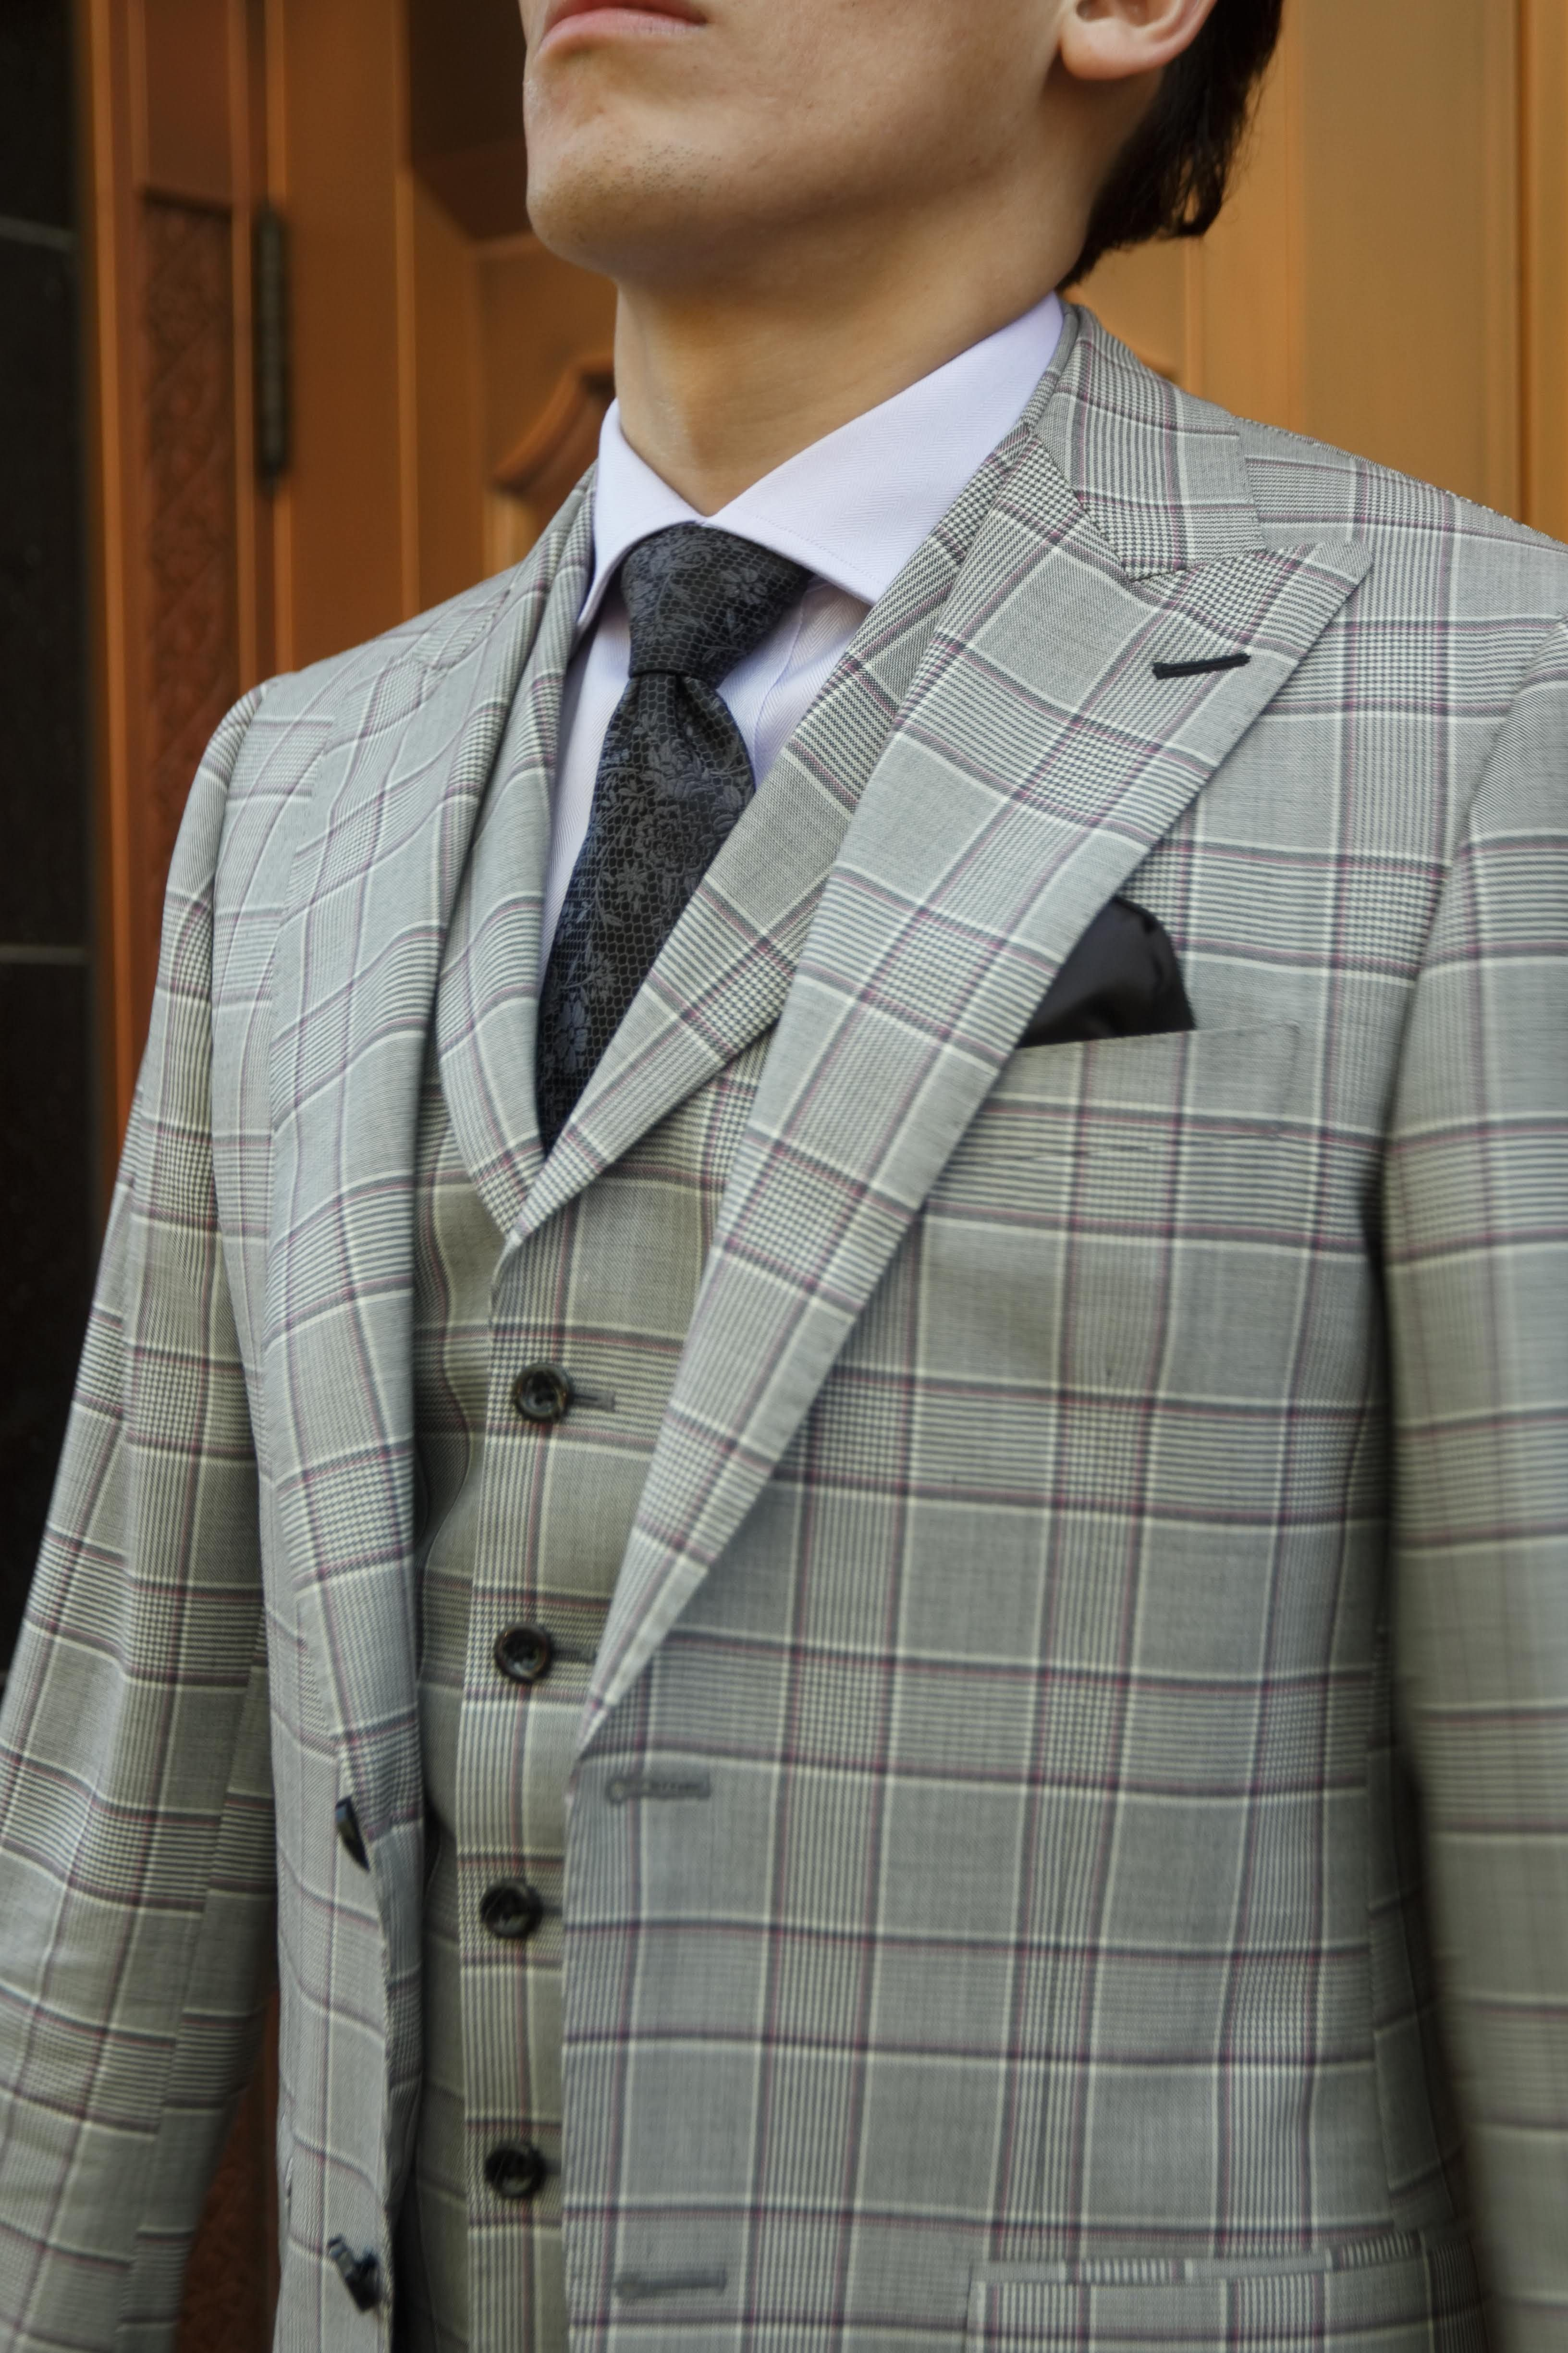 2020 Suit Trends.Mens Grey Purple Plaid Suit Three Piece Bespoke Trends 2020